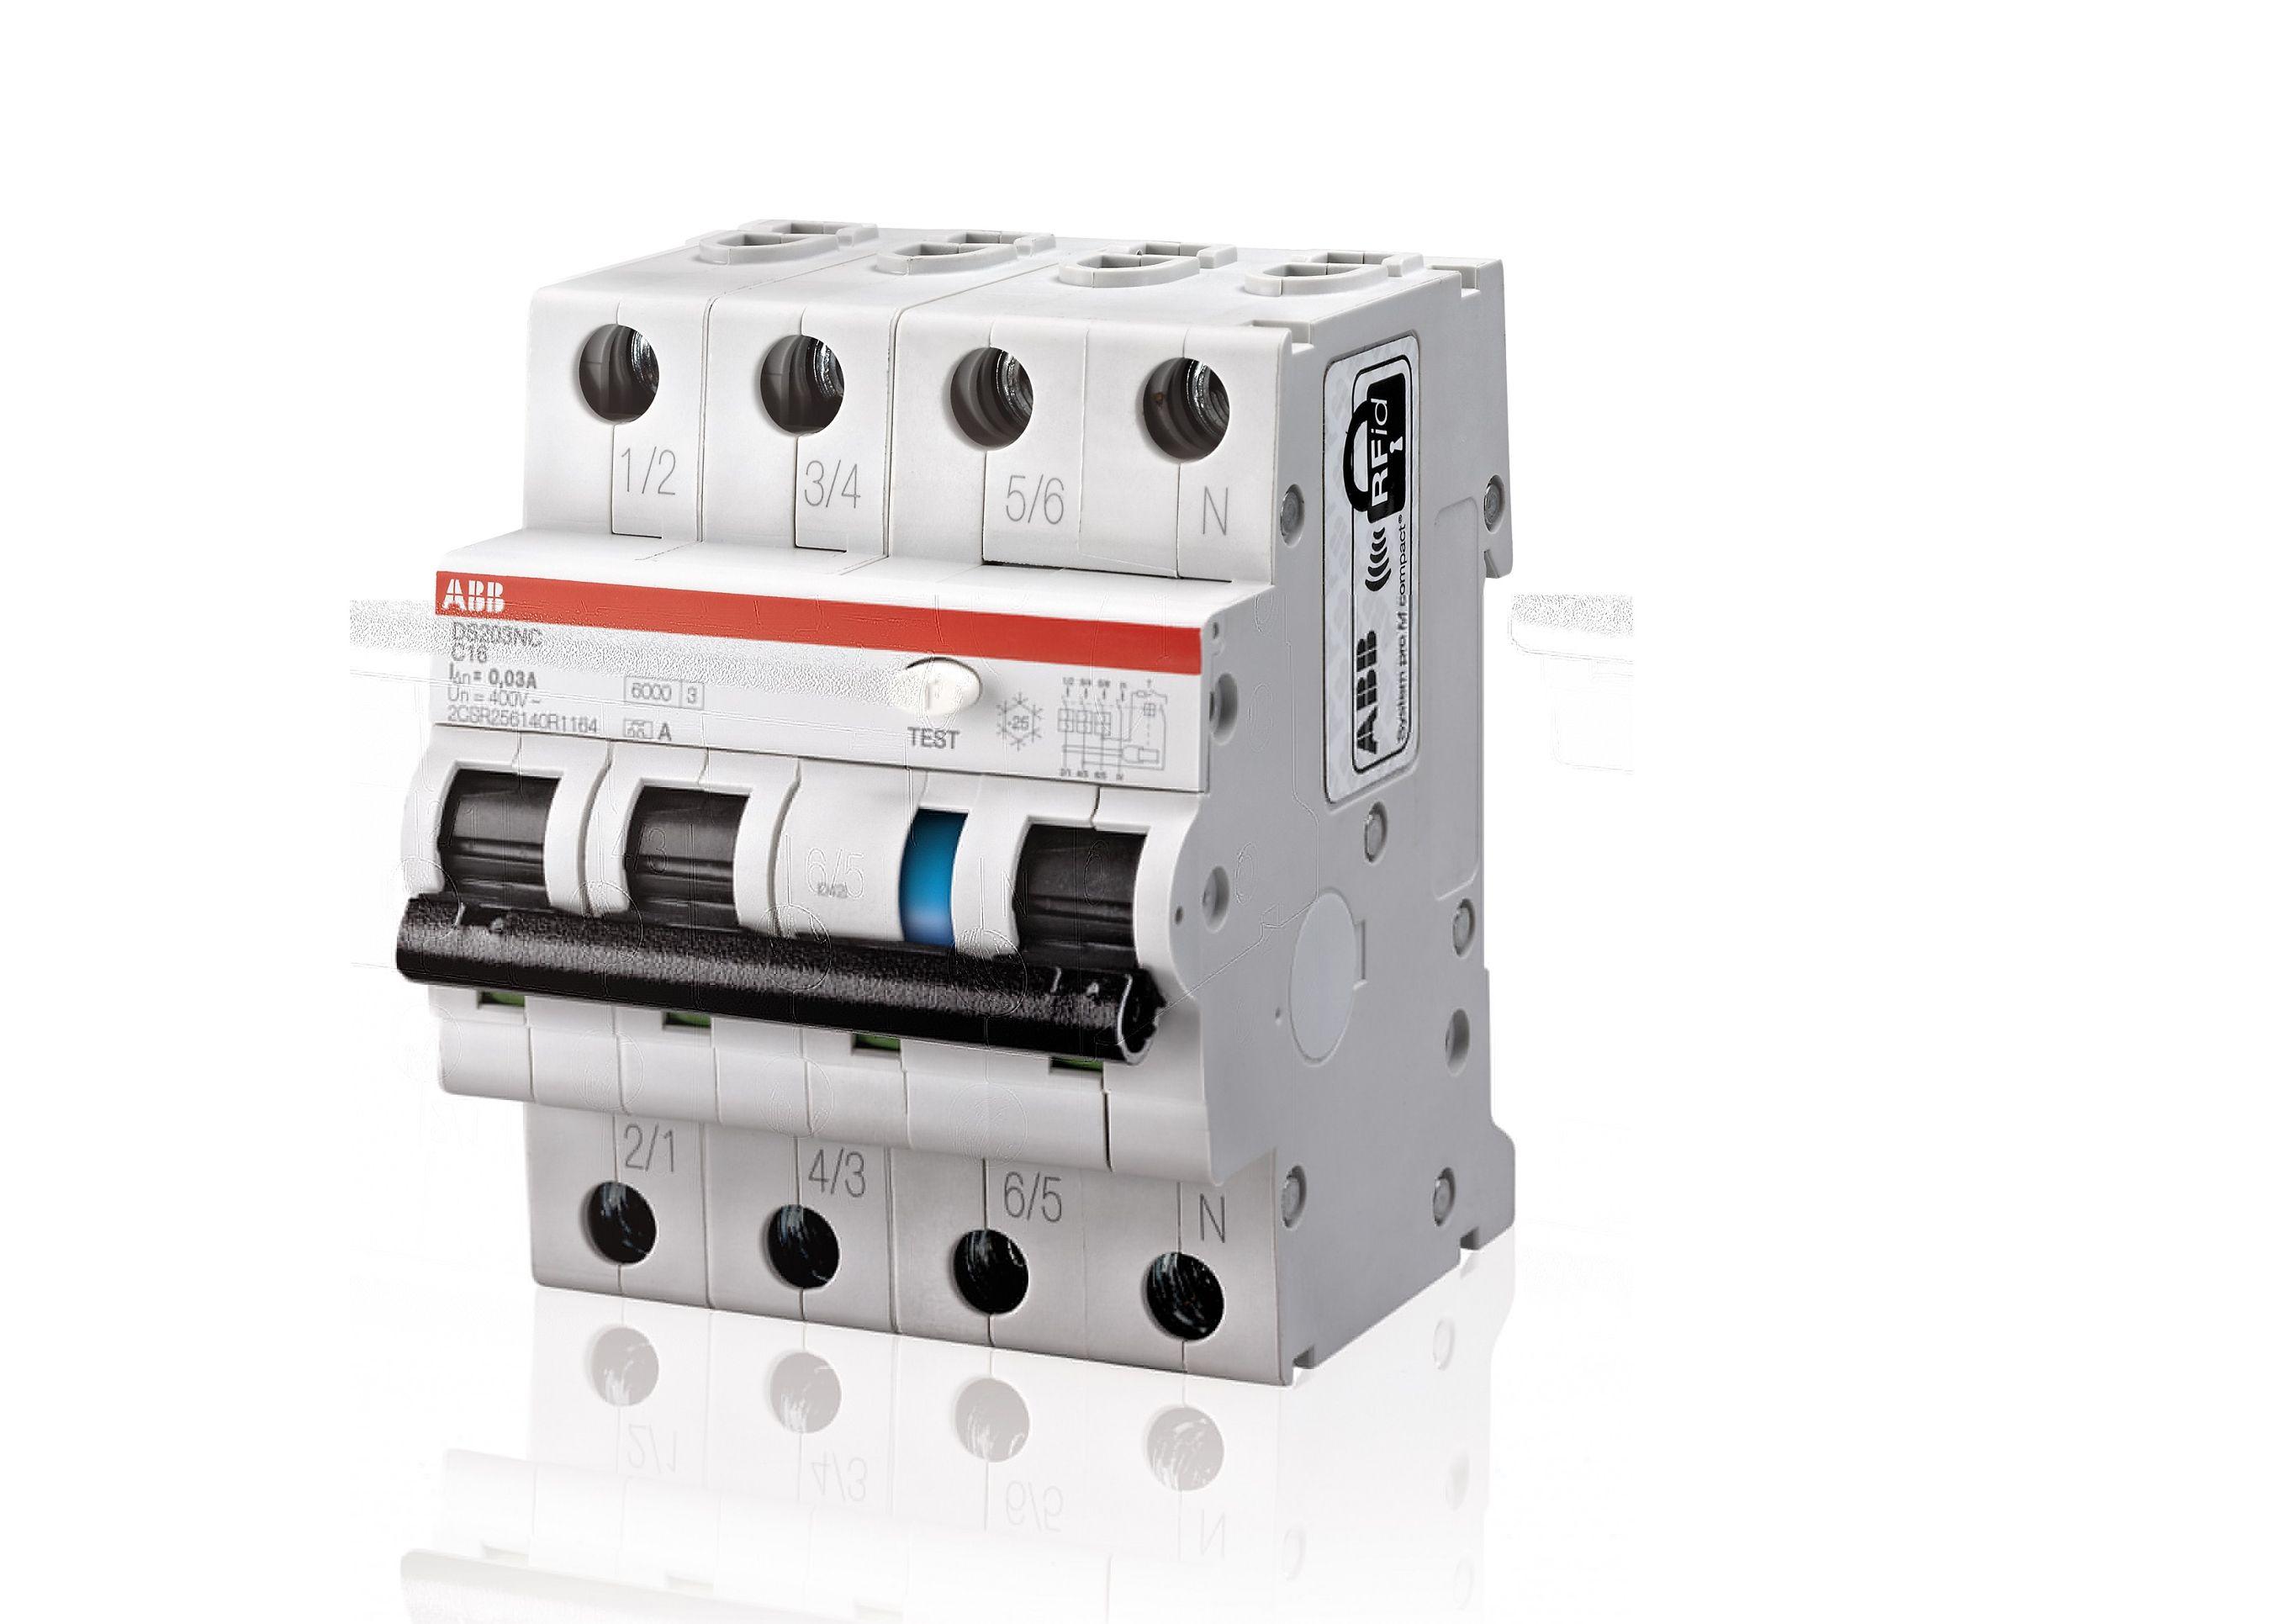 Schemi Elettrici Deviatori Interruttori : Interruttori magnetotermici differenziali l impianto